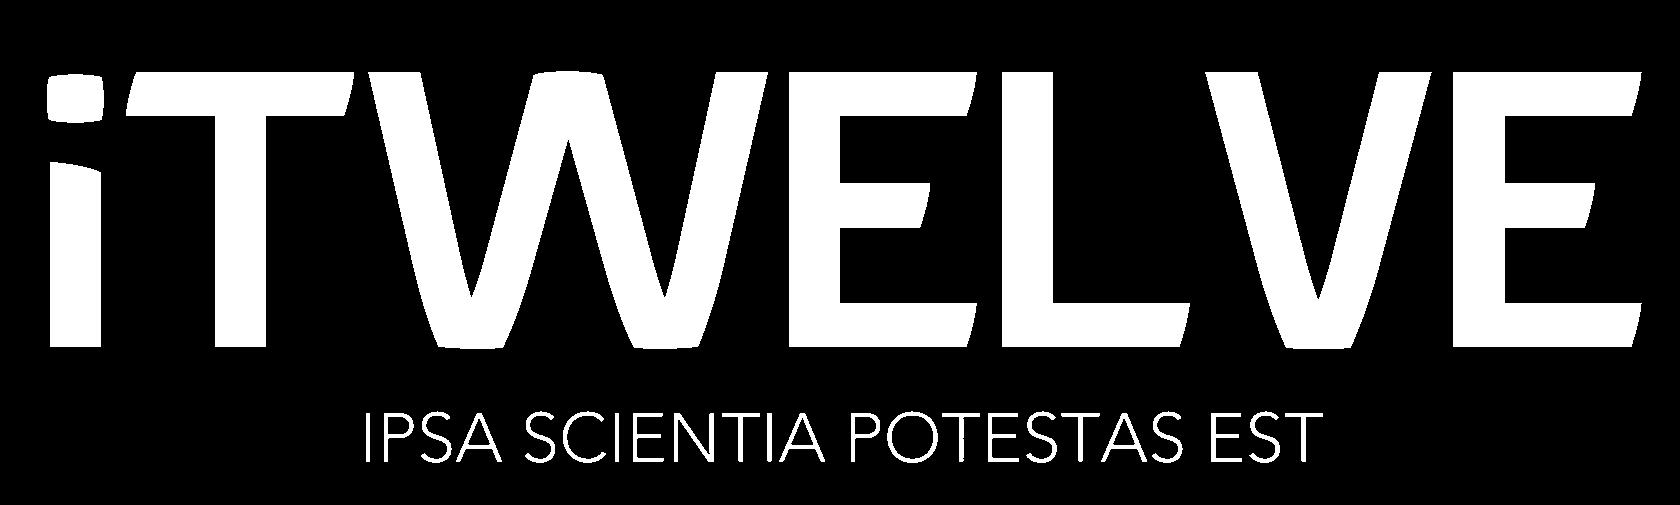 iTWELVE